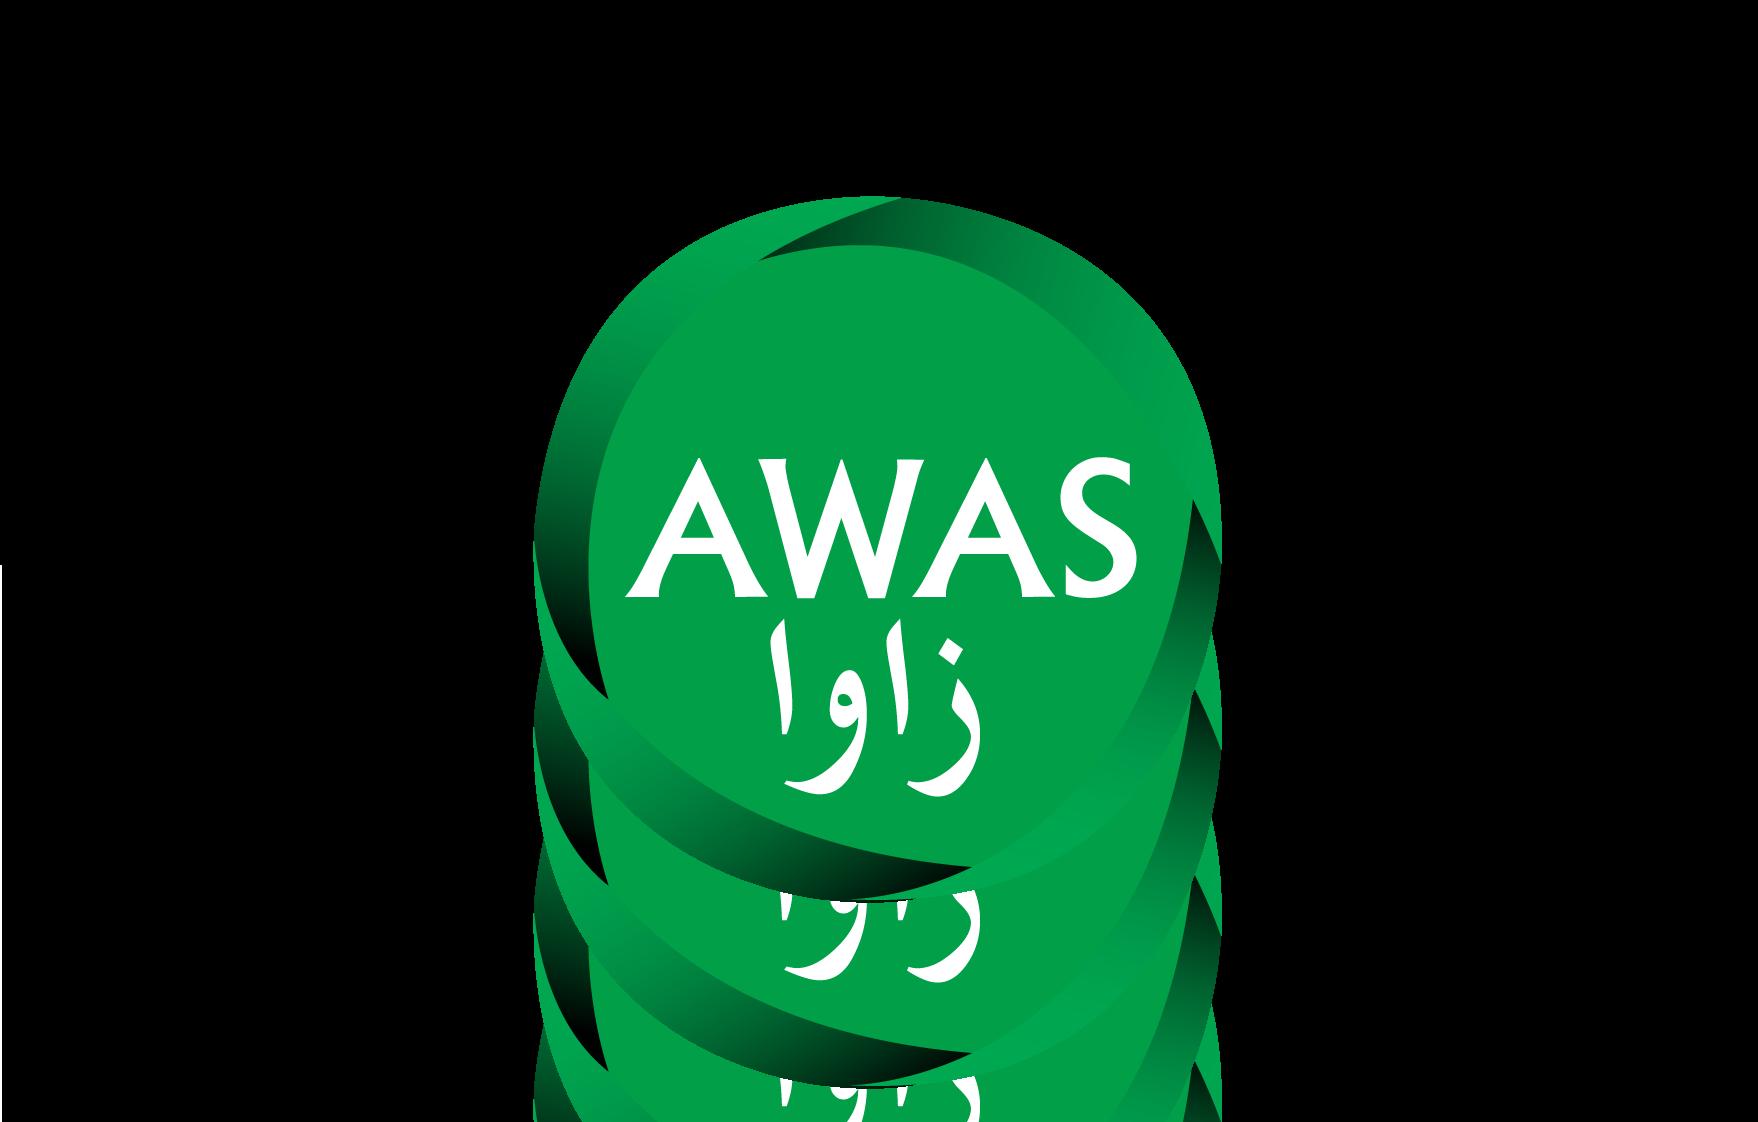 Logo Design by Private User - Entry No. 7 in the Logo Design Contest AWAS Logo Design.